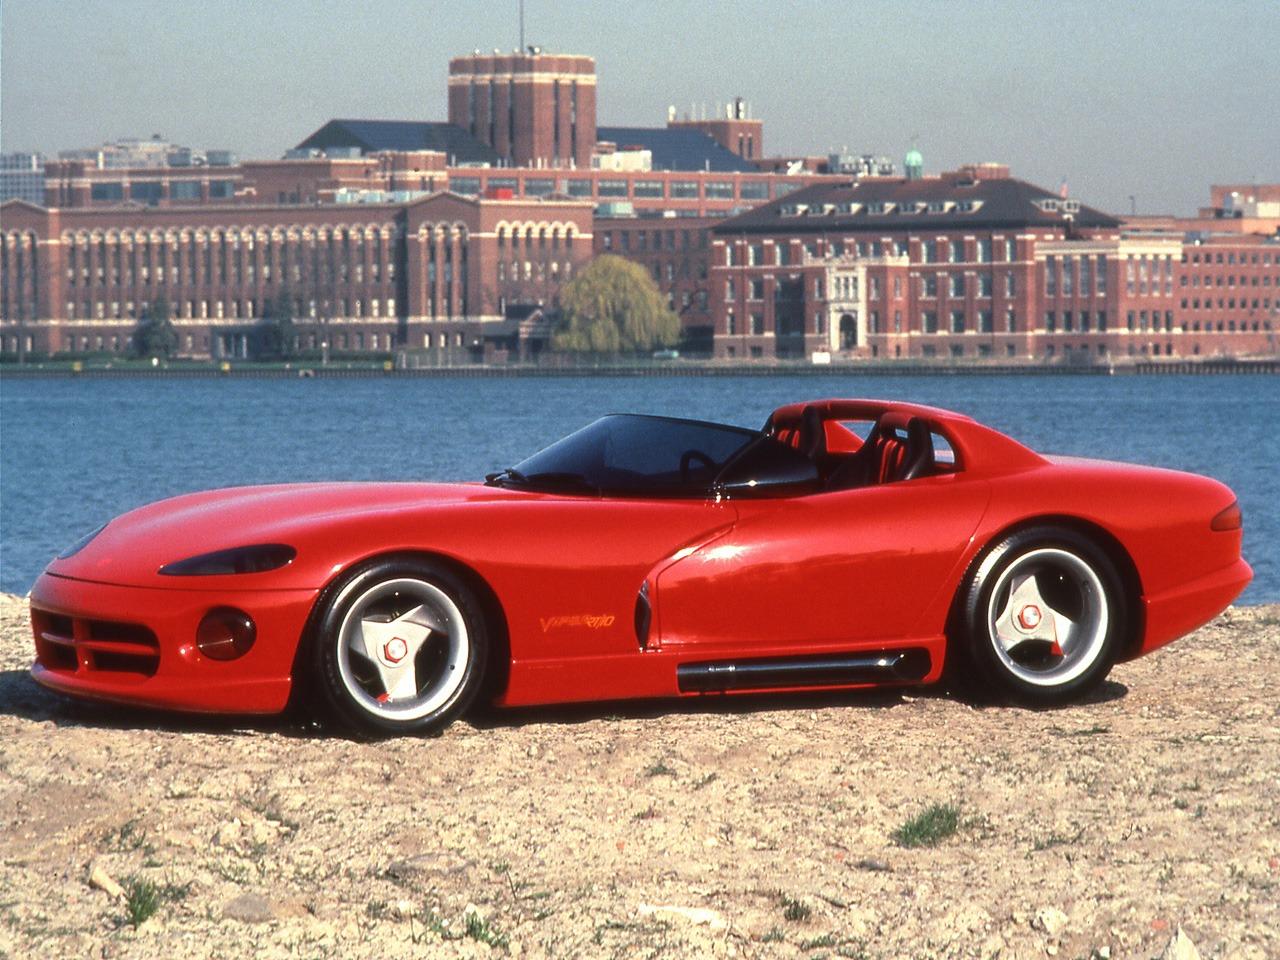 2013 dodge viper srt gts wallpapers 1418 sports cars